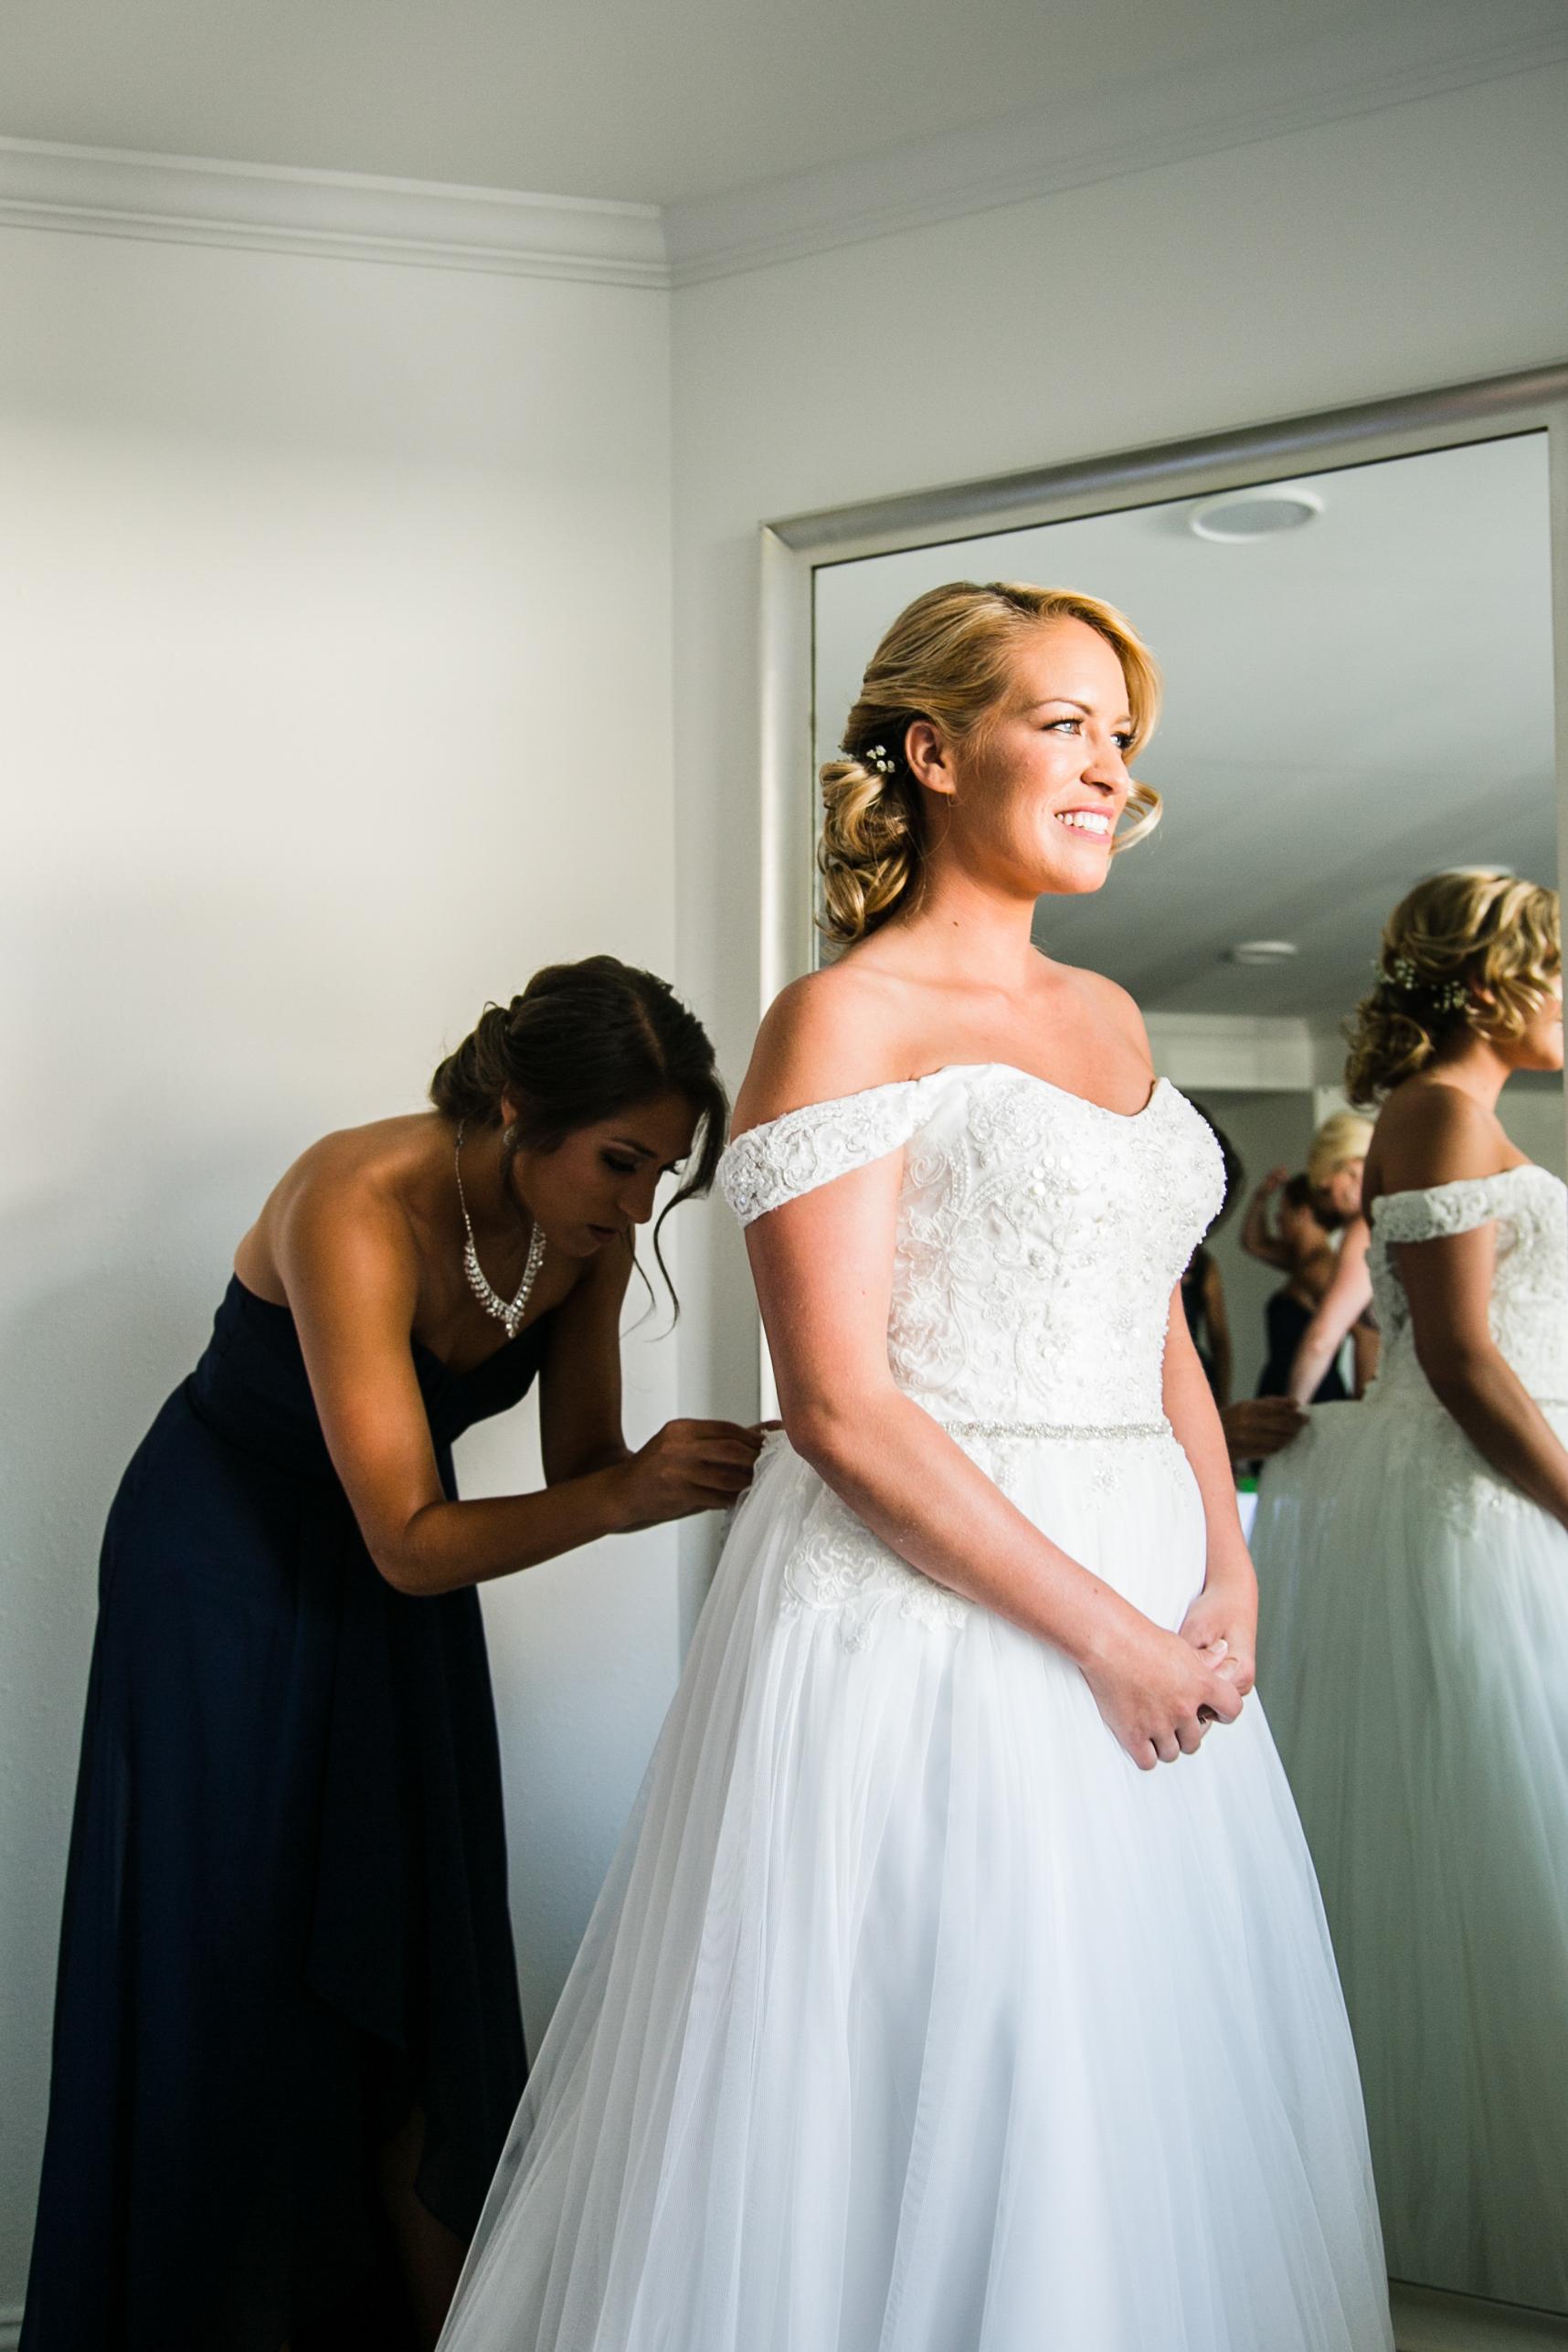 ICONA GOLDEN INN AVALON NJ WEDDING PHOTOGRAPHY  - 016.jpg